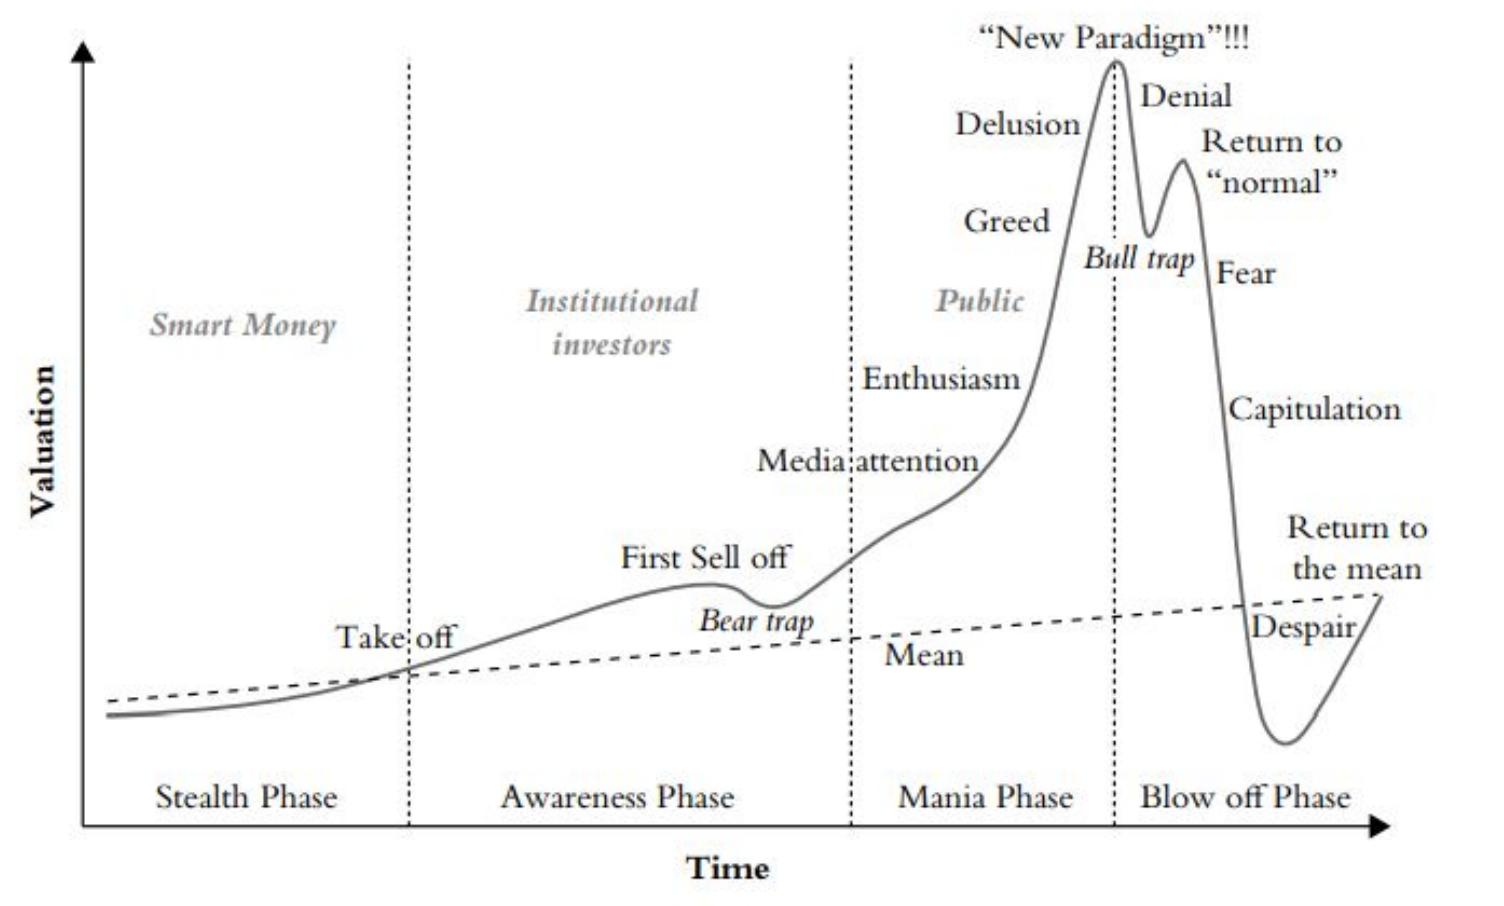 Ciklus tržišta